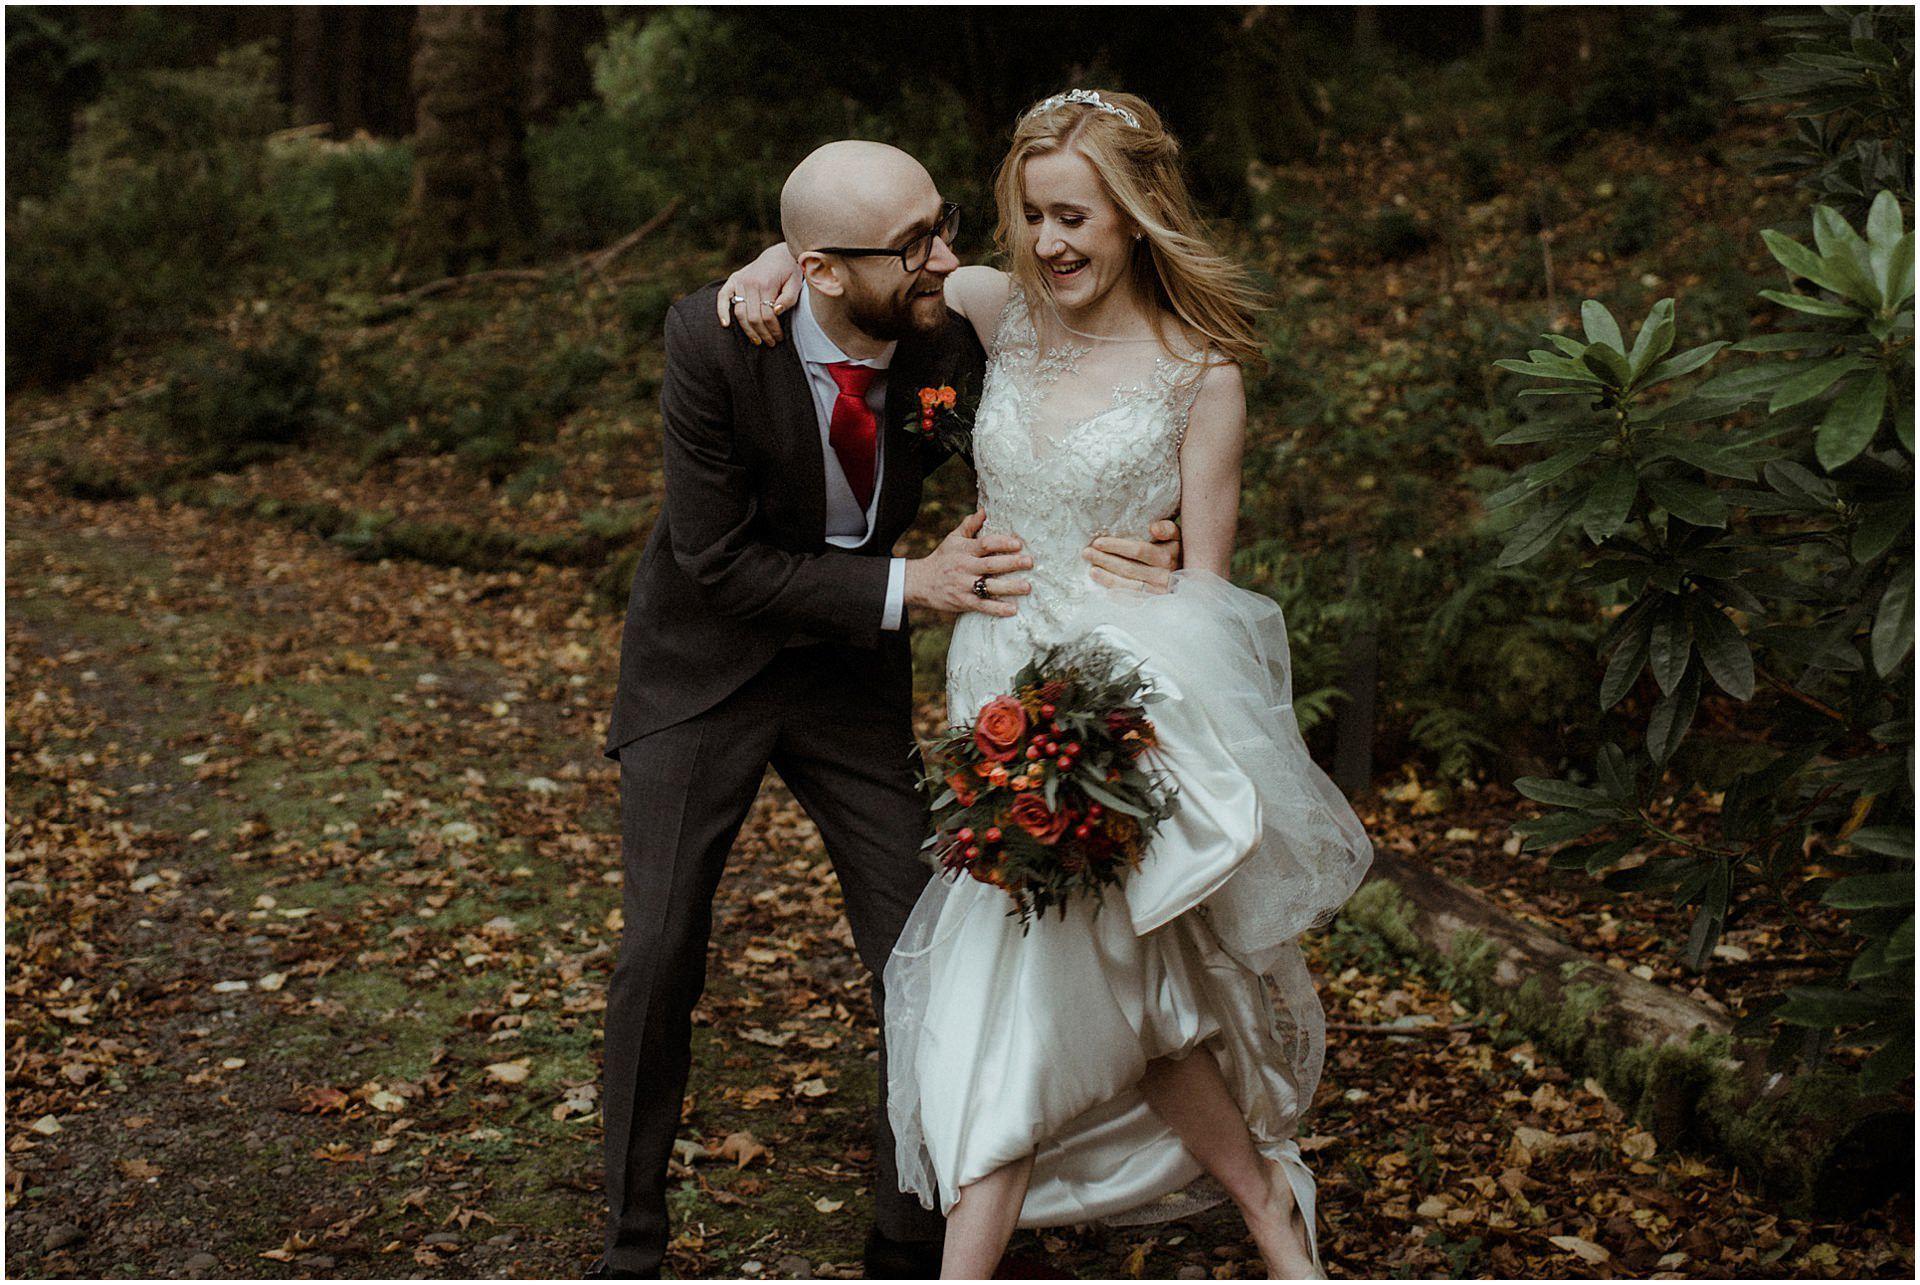 glencoe elopement bride and groom